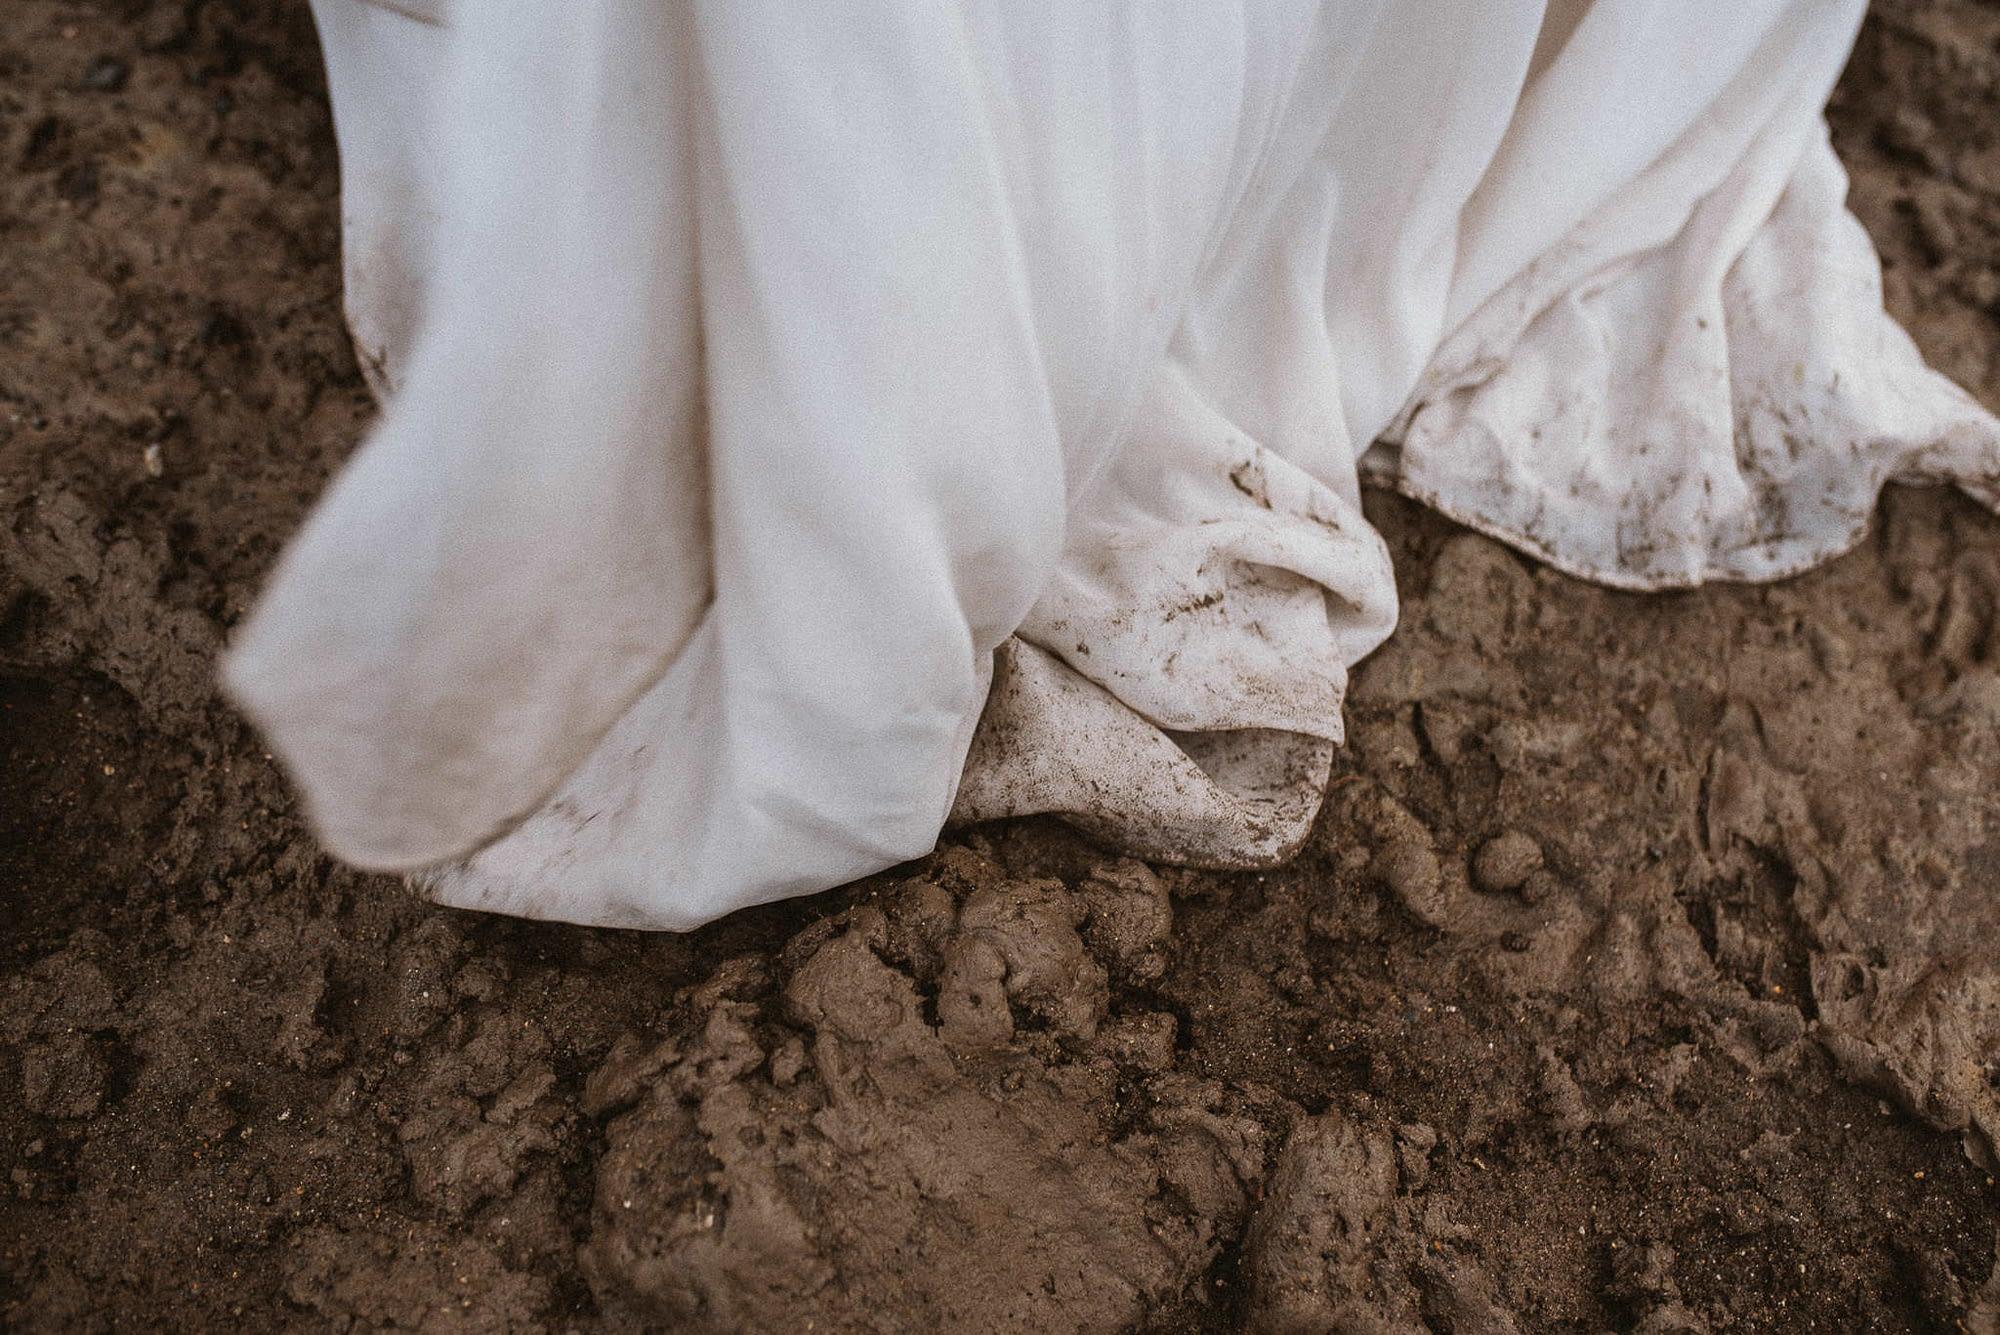 refugios-embalse del yeso-fotografo de matrimonios santiago